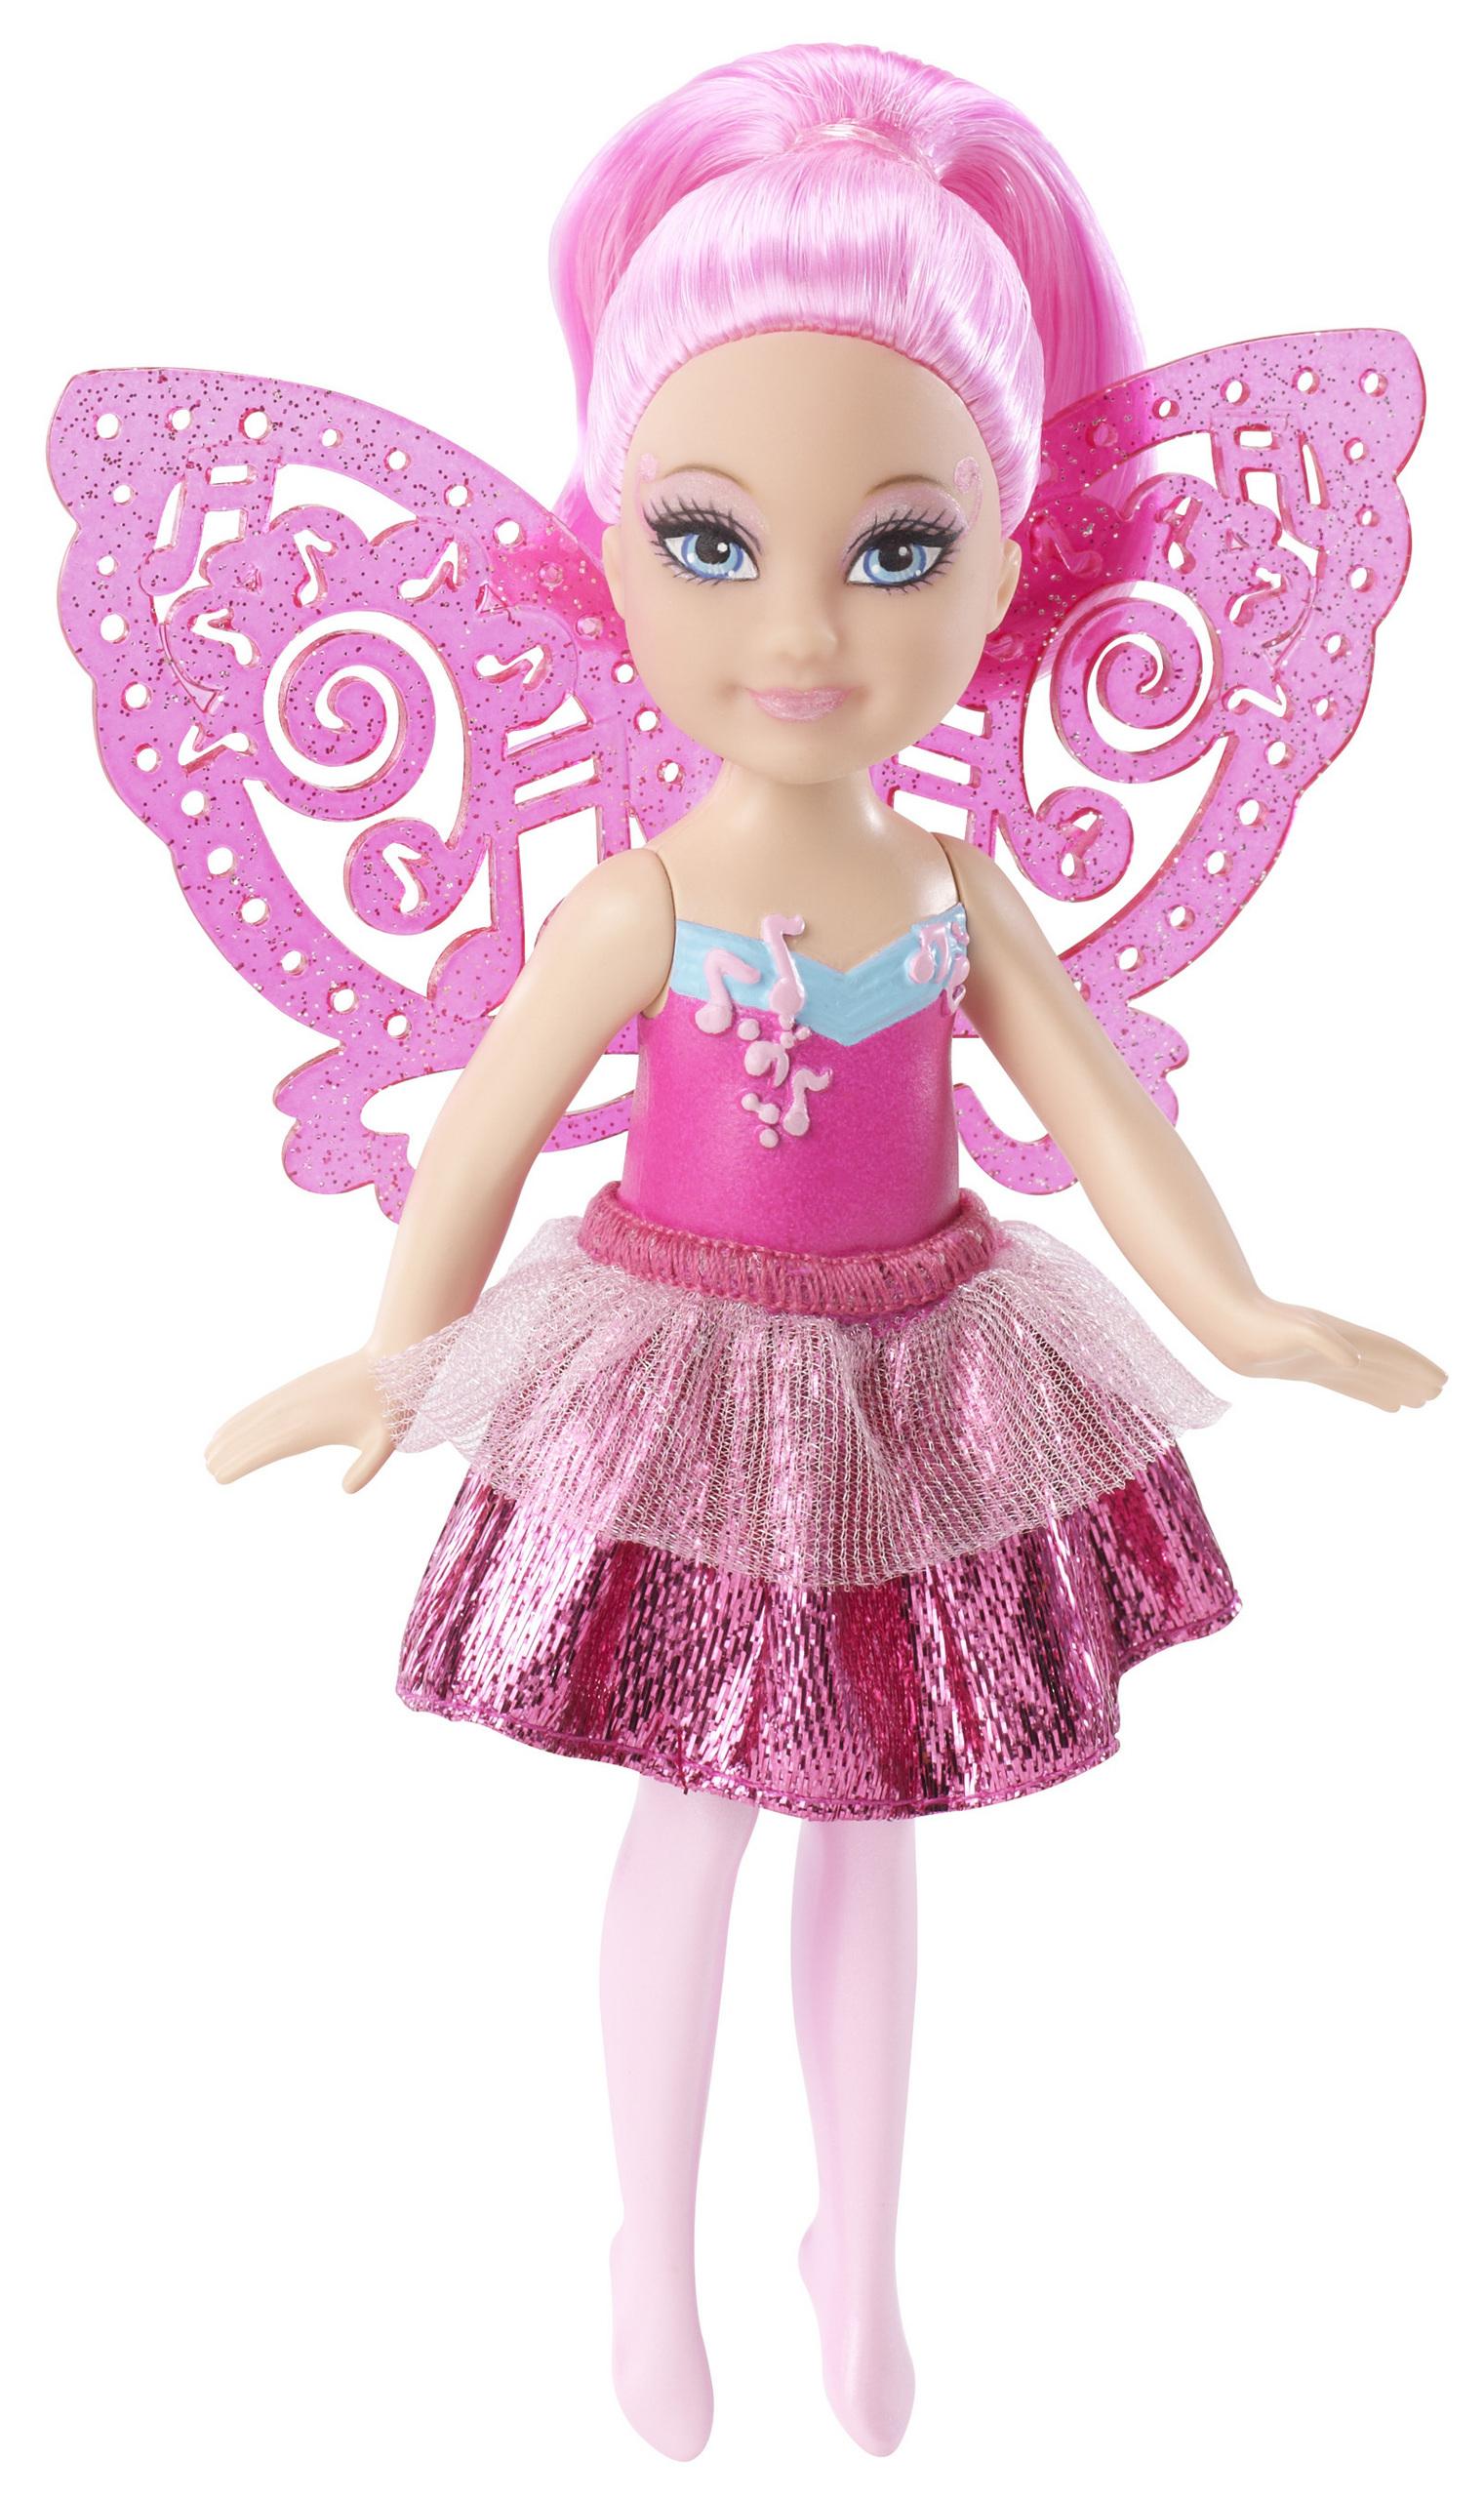 Barbie PaP Castle 2 and Assortment Fairy  - barbie-movies photo